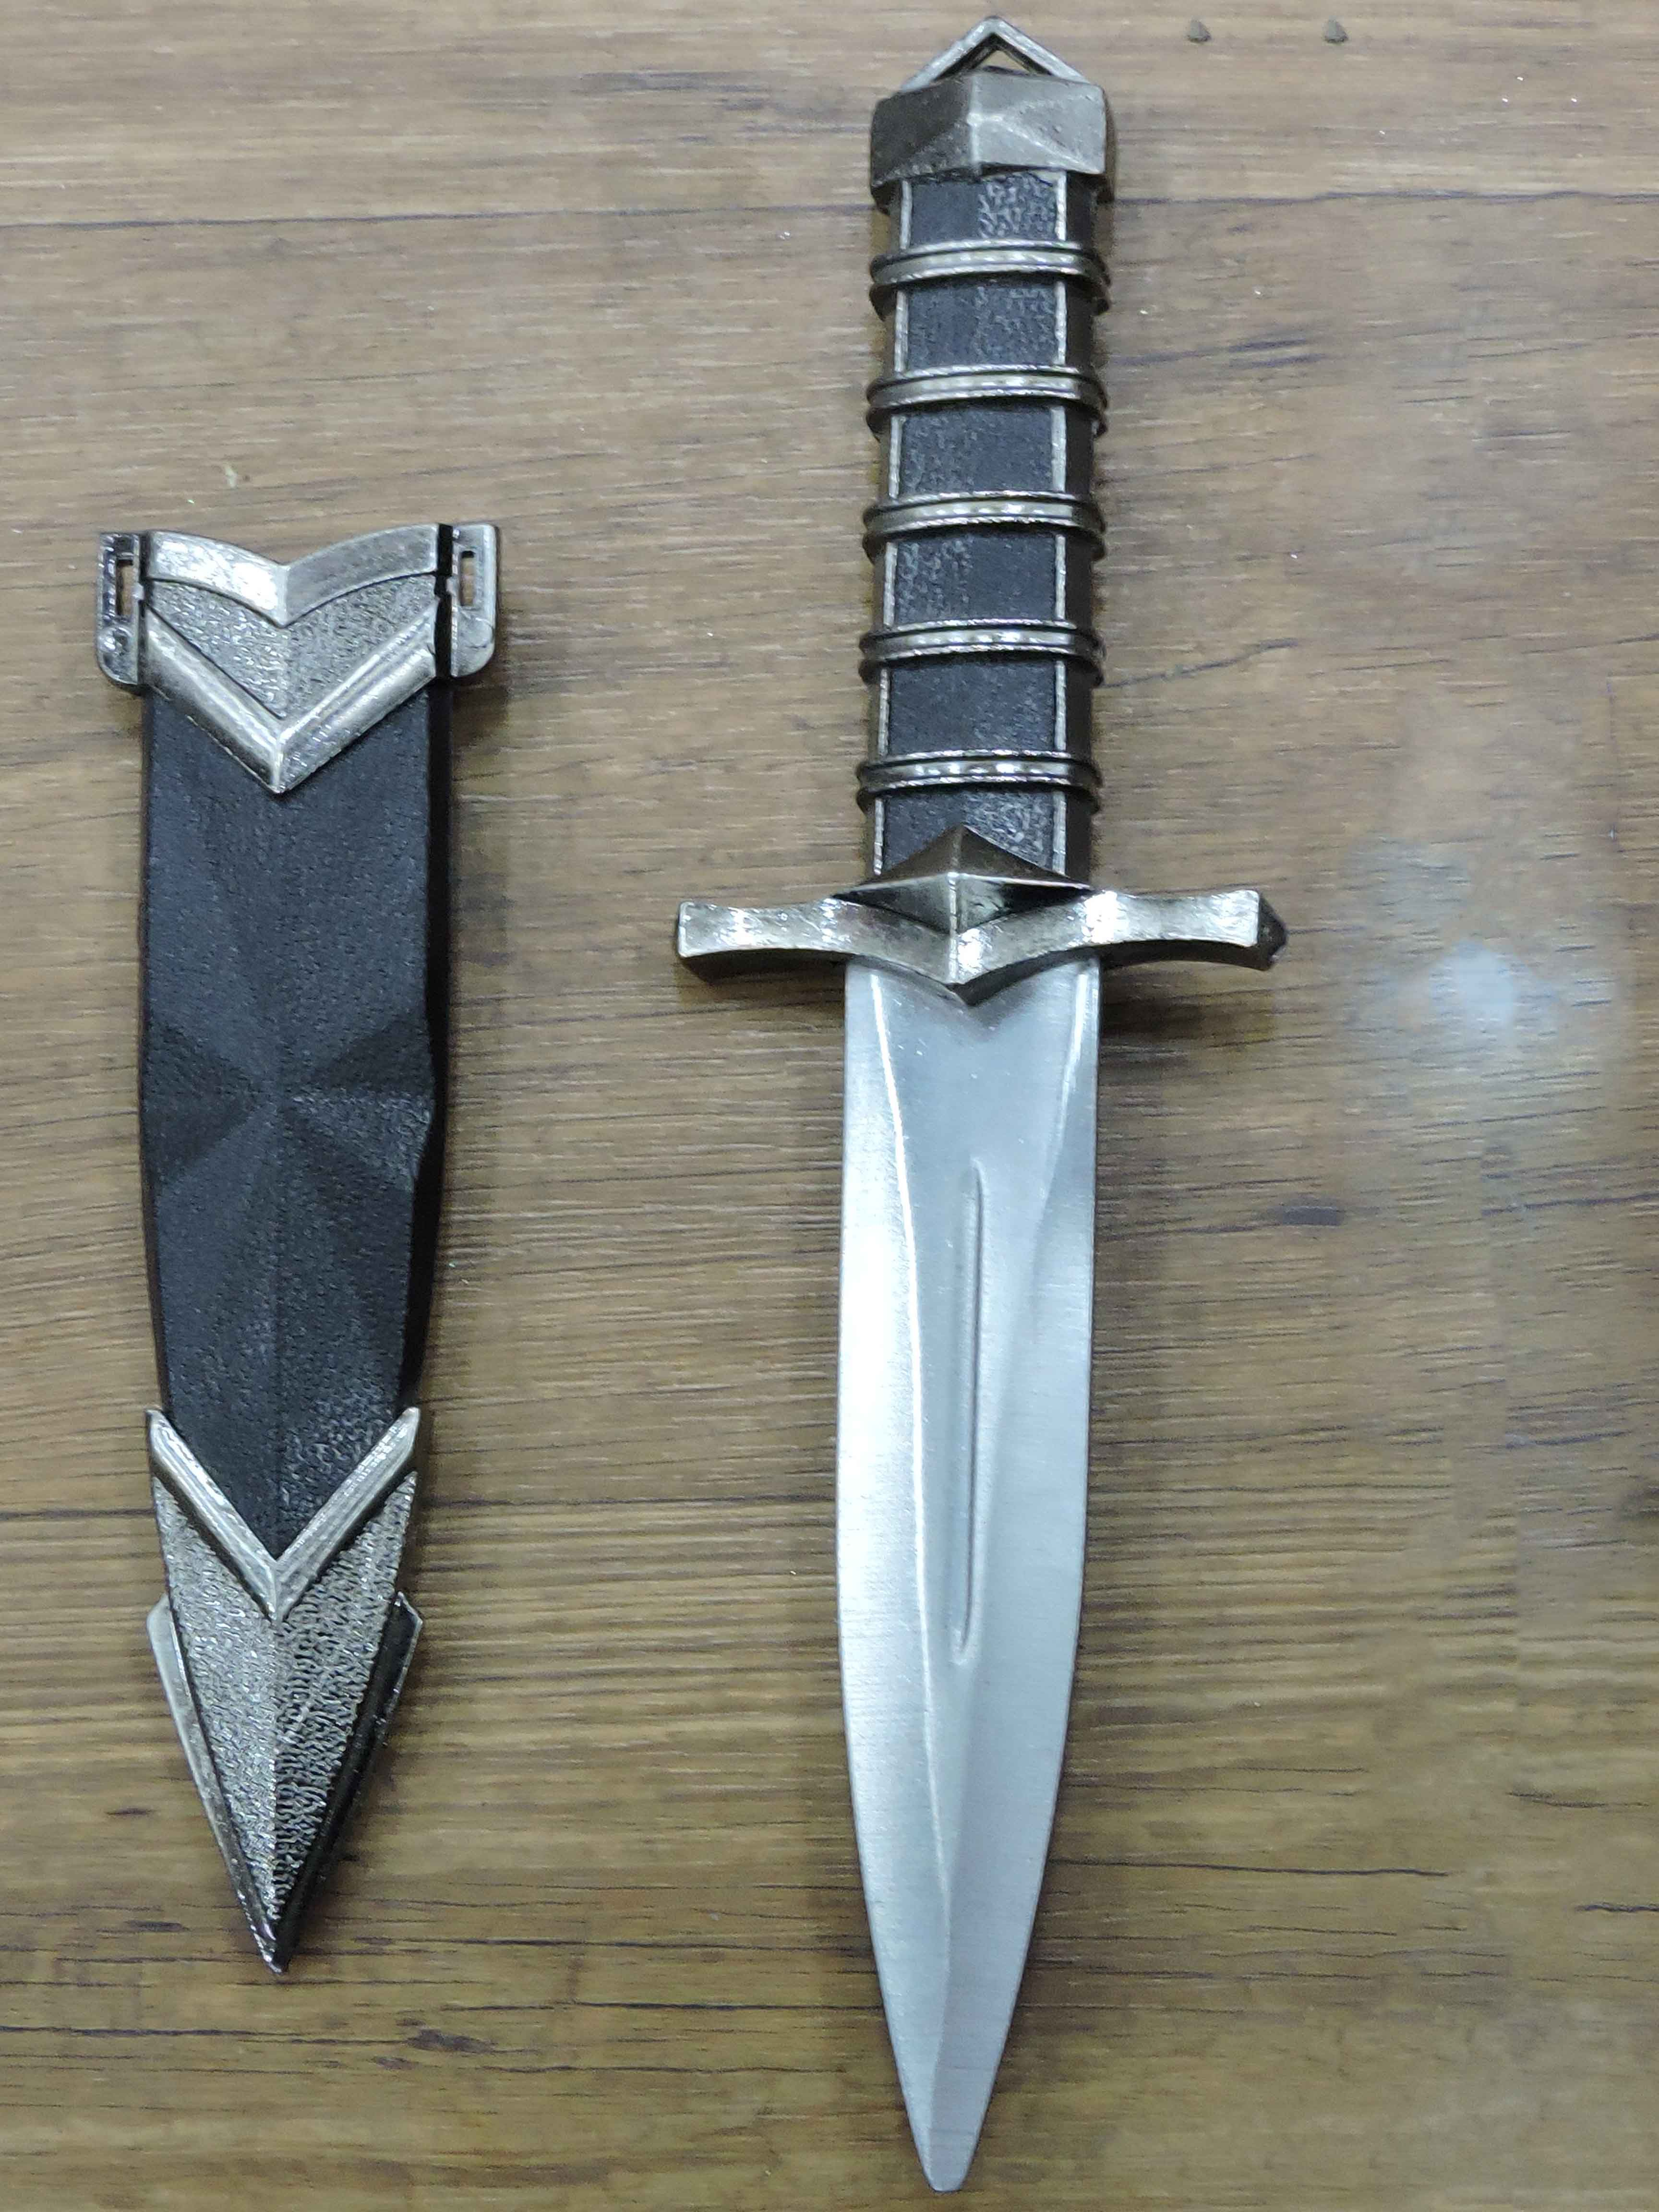 Chinese-sword-Decoration-Steel-Blade-No-Edge-28-cm.